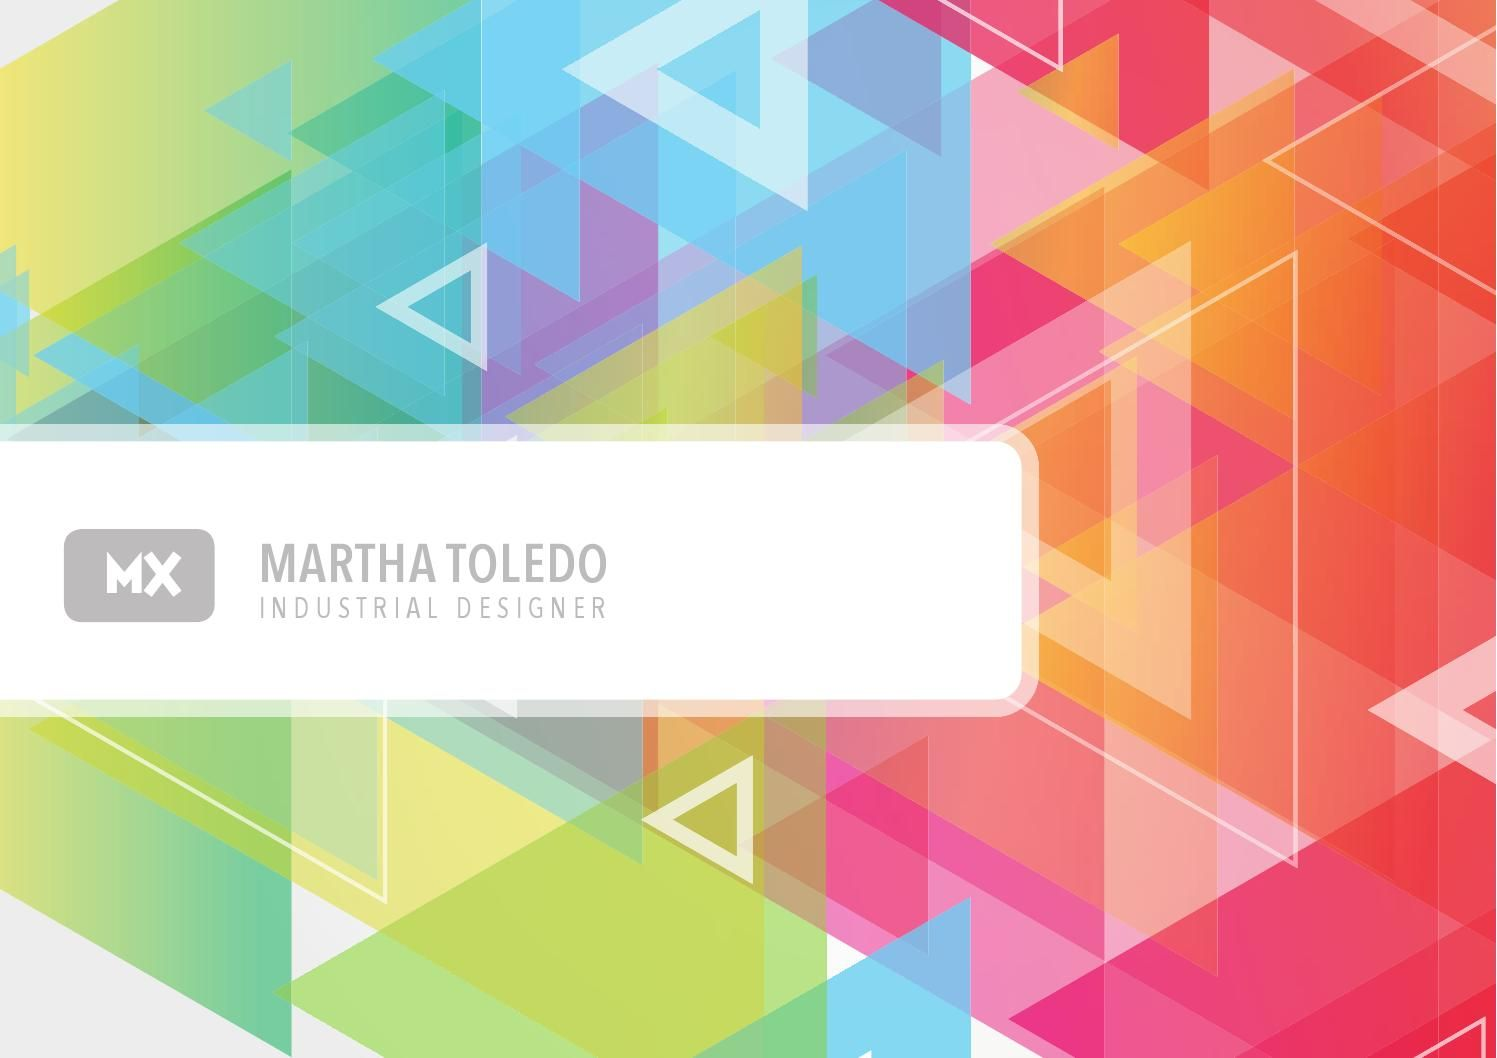 Martha Toledo > Industrial Design Portfolio Enrich experiences. Swell passion for design.